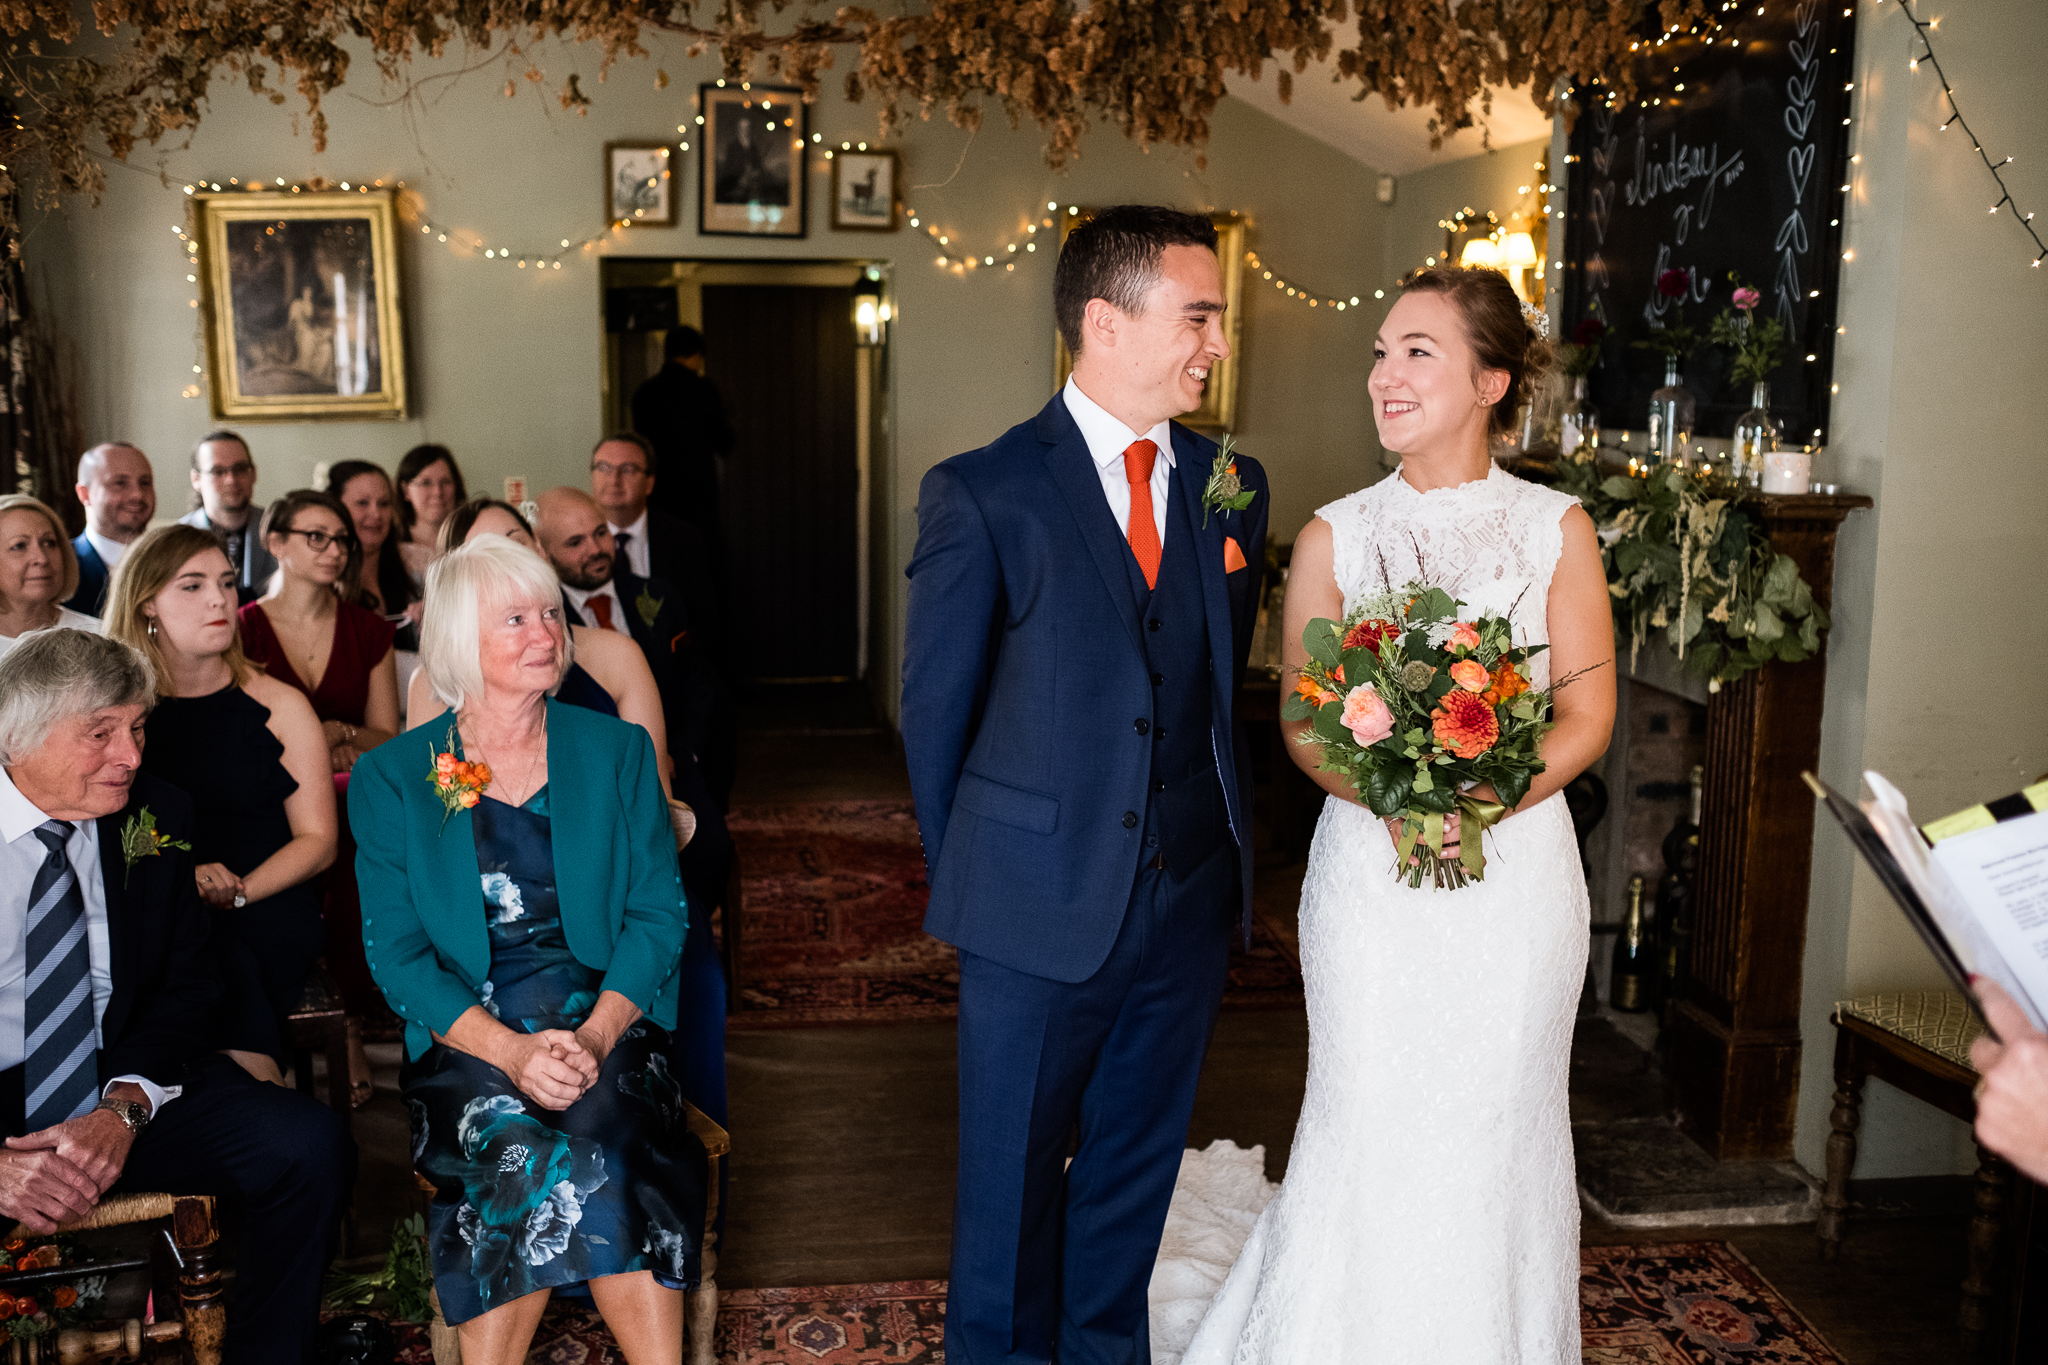 Relaxed Documentary Wedding Photography at The Wizard Inn, Alderley Edge Cheshire - Jenny Harper-22.jpg